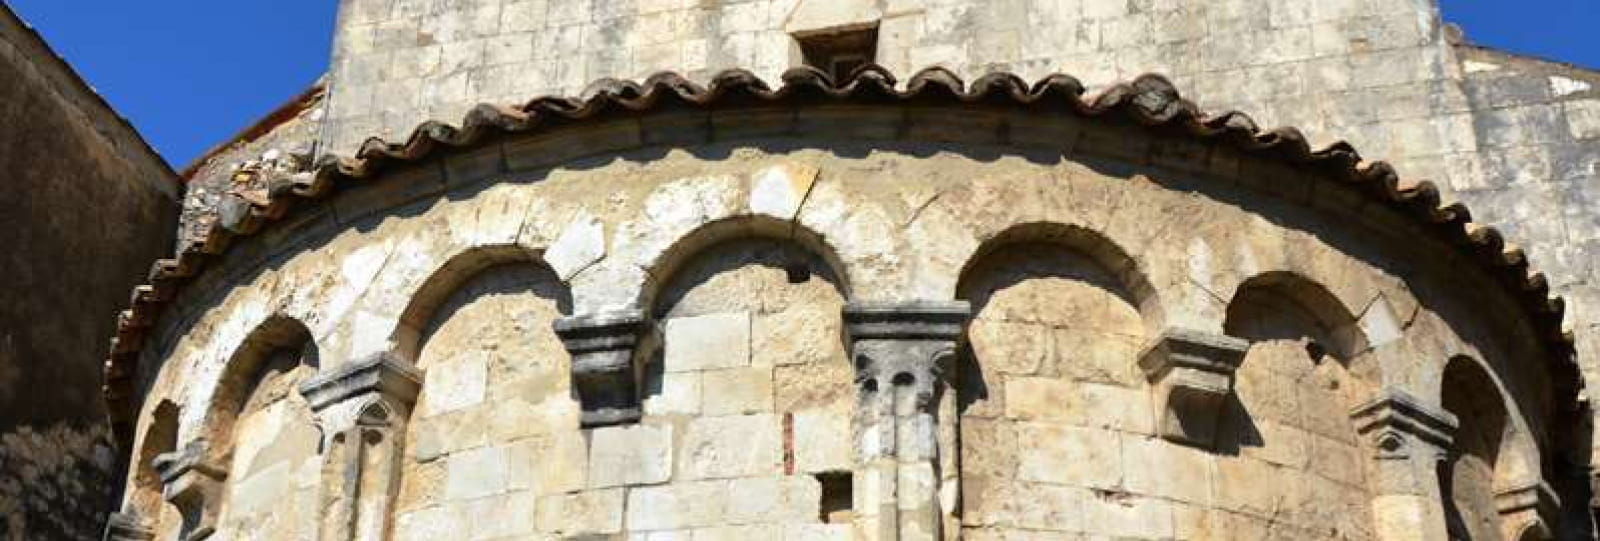 Eglise Saint Philibert